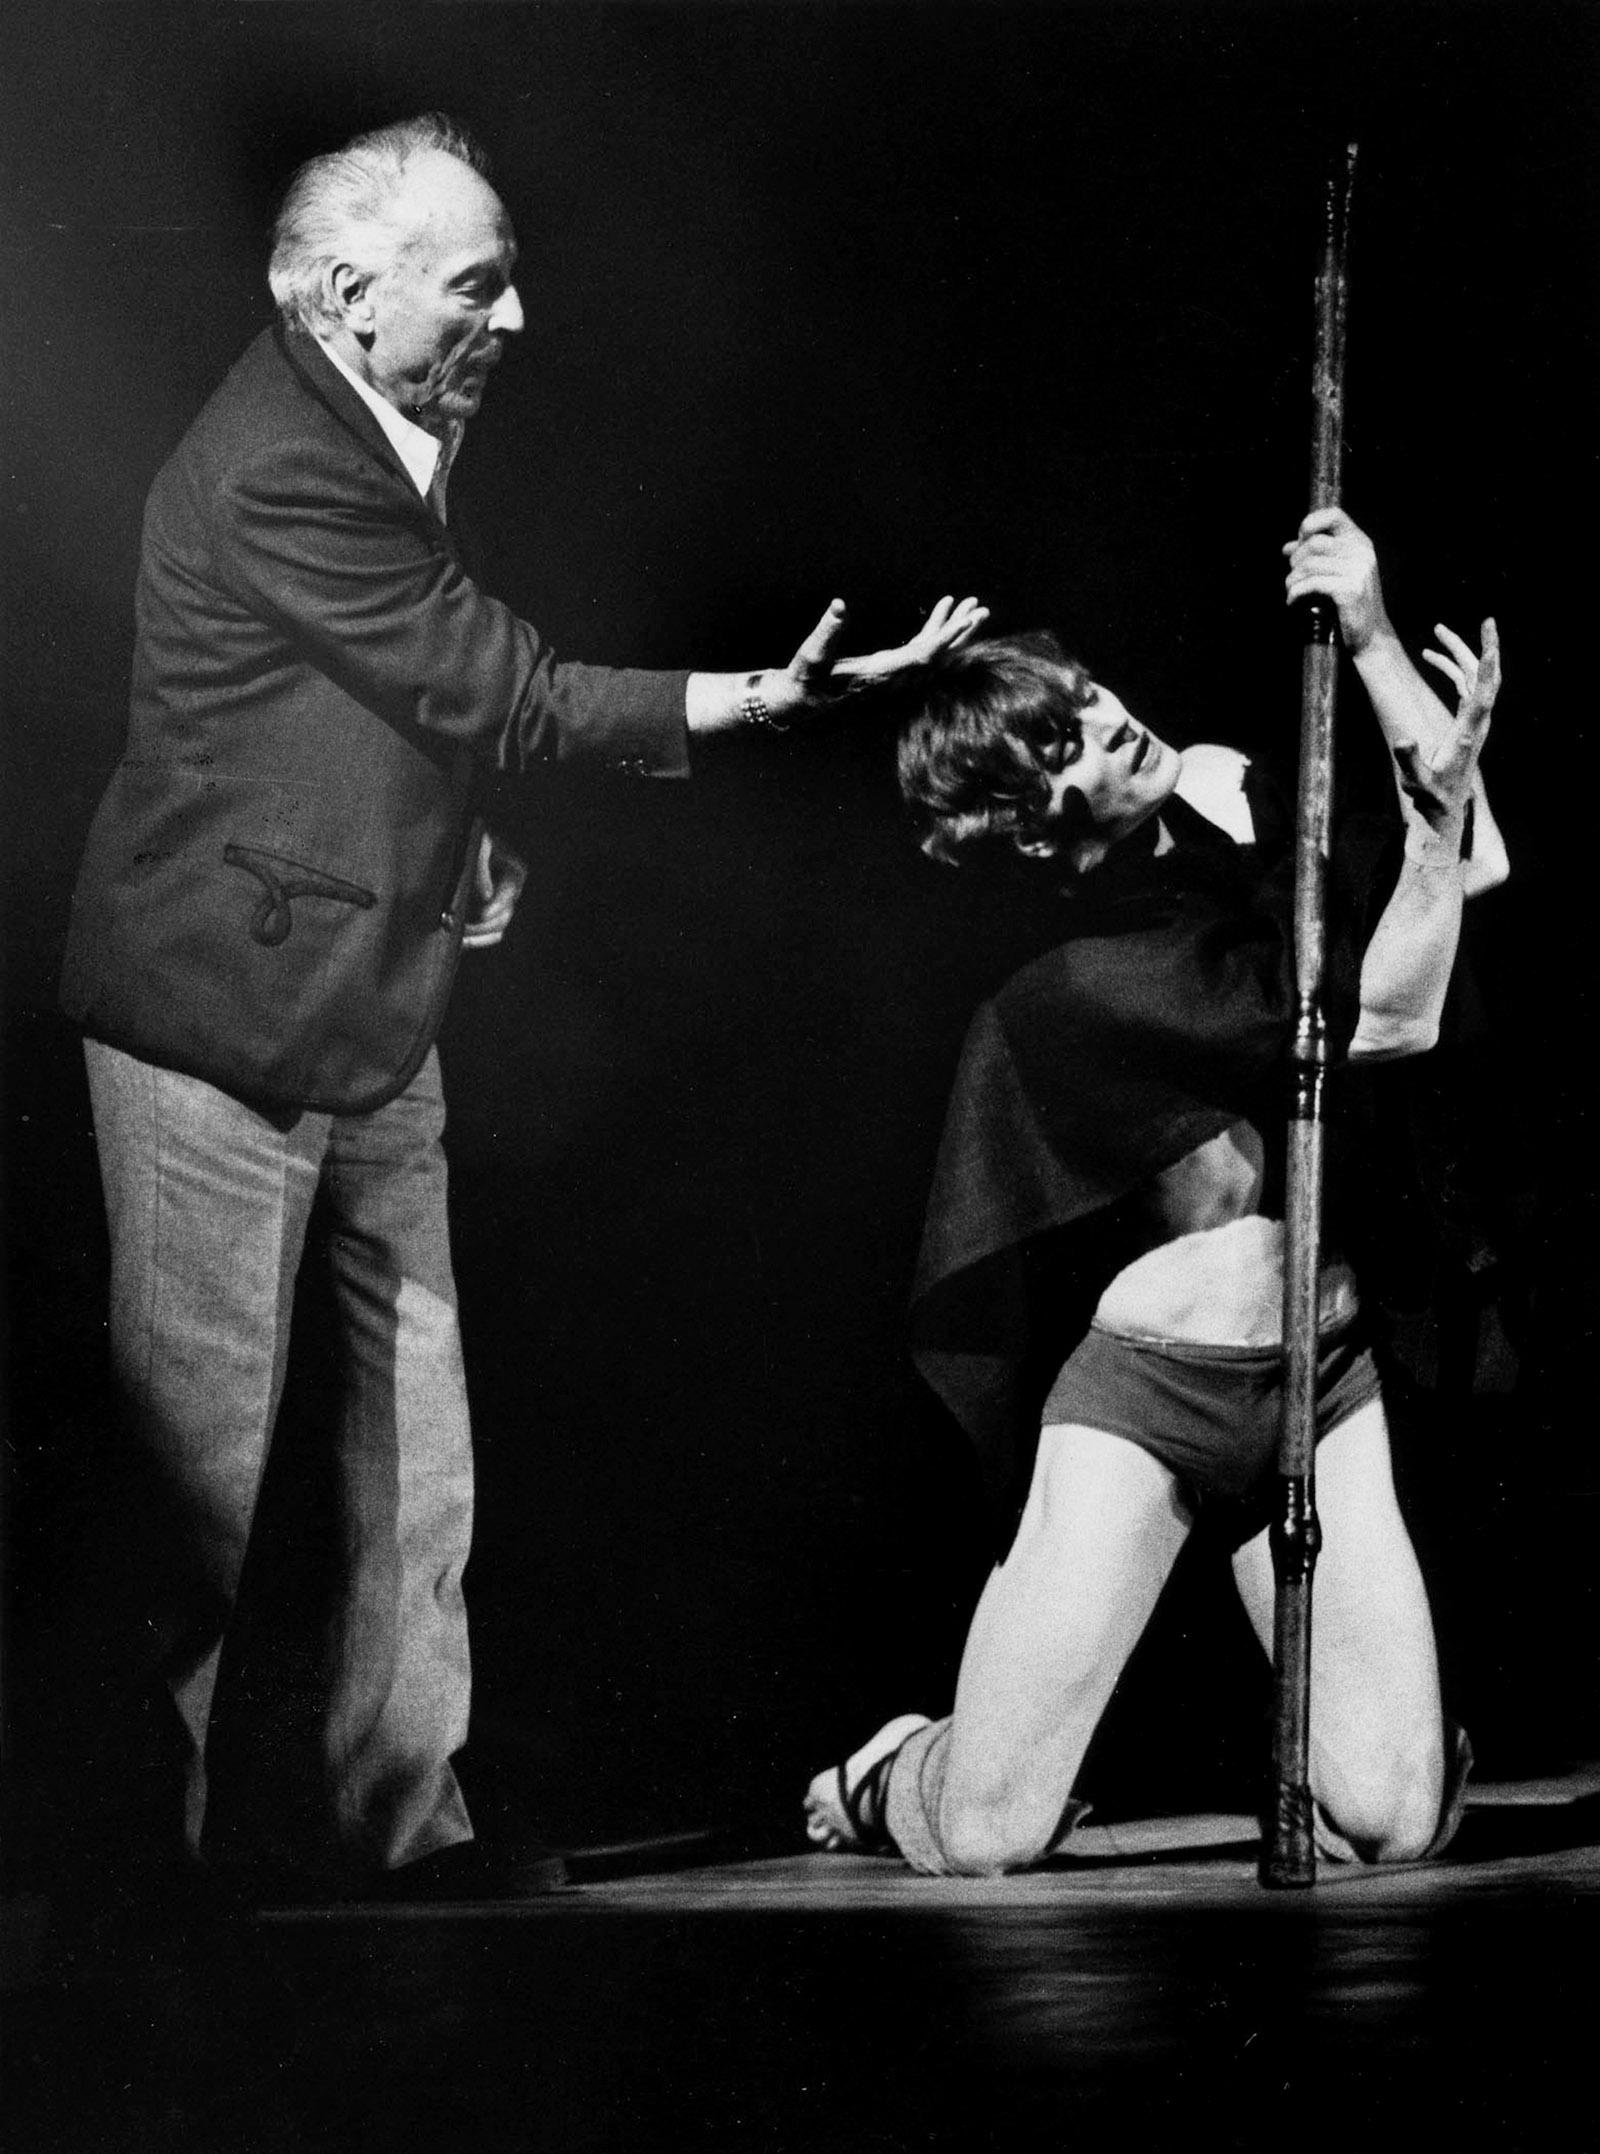 George Balanchine and Mikhail Baryshnikov rehearsing Prodigal Son at the New York City Ballet, 1979